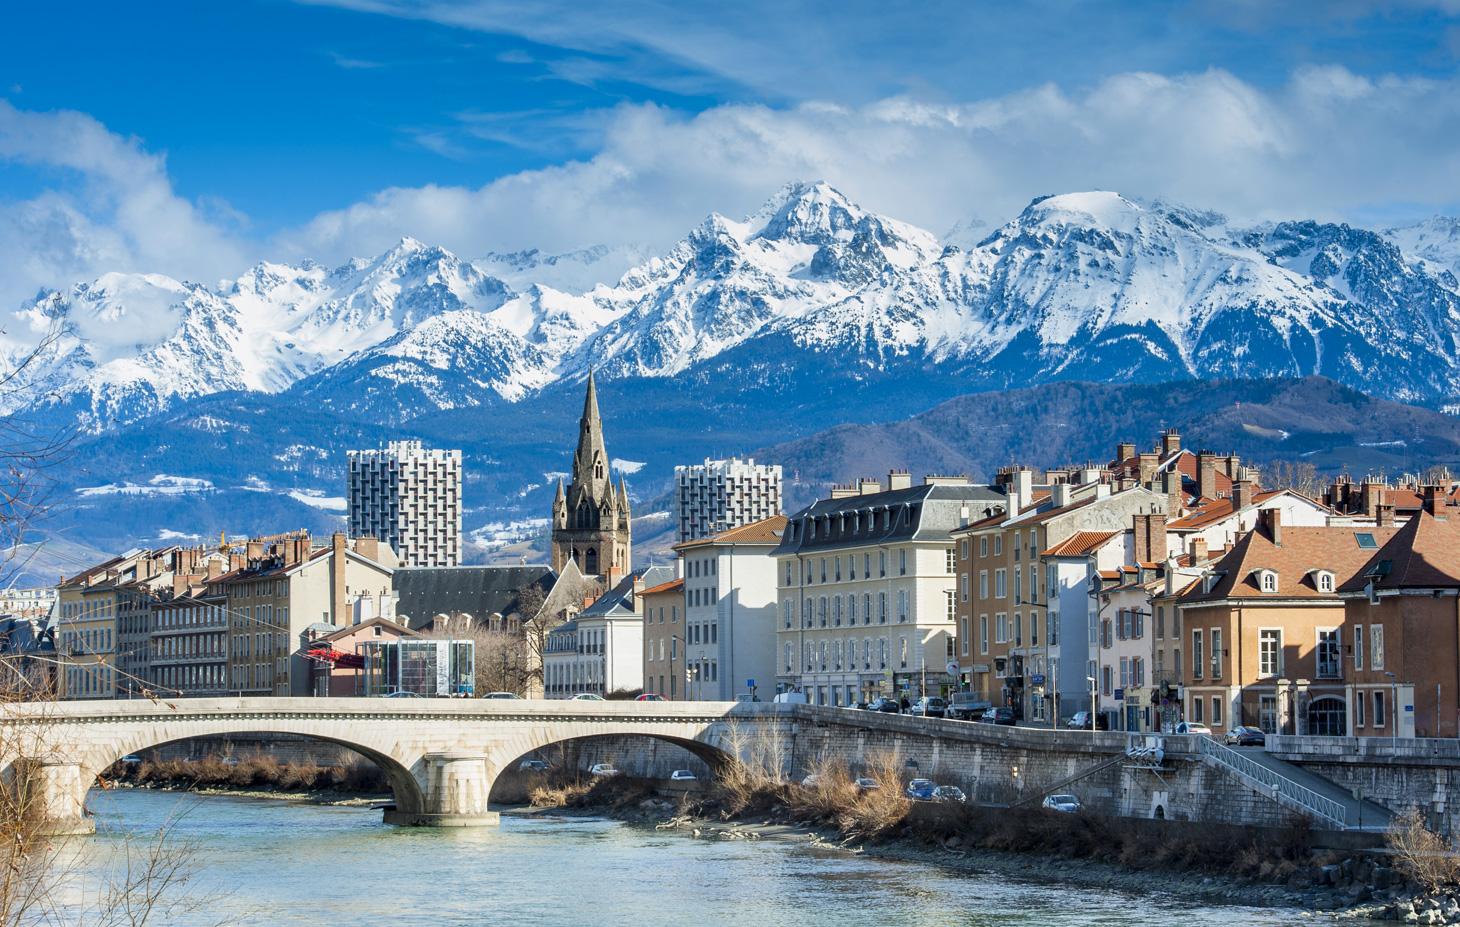 Come to Grenoble Alpes university